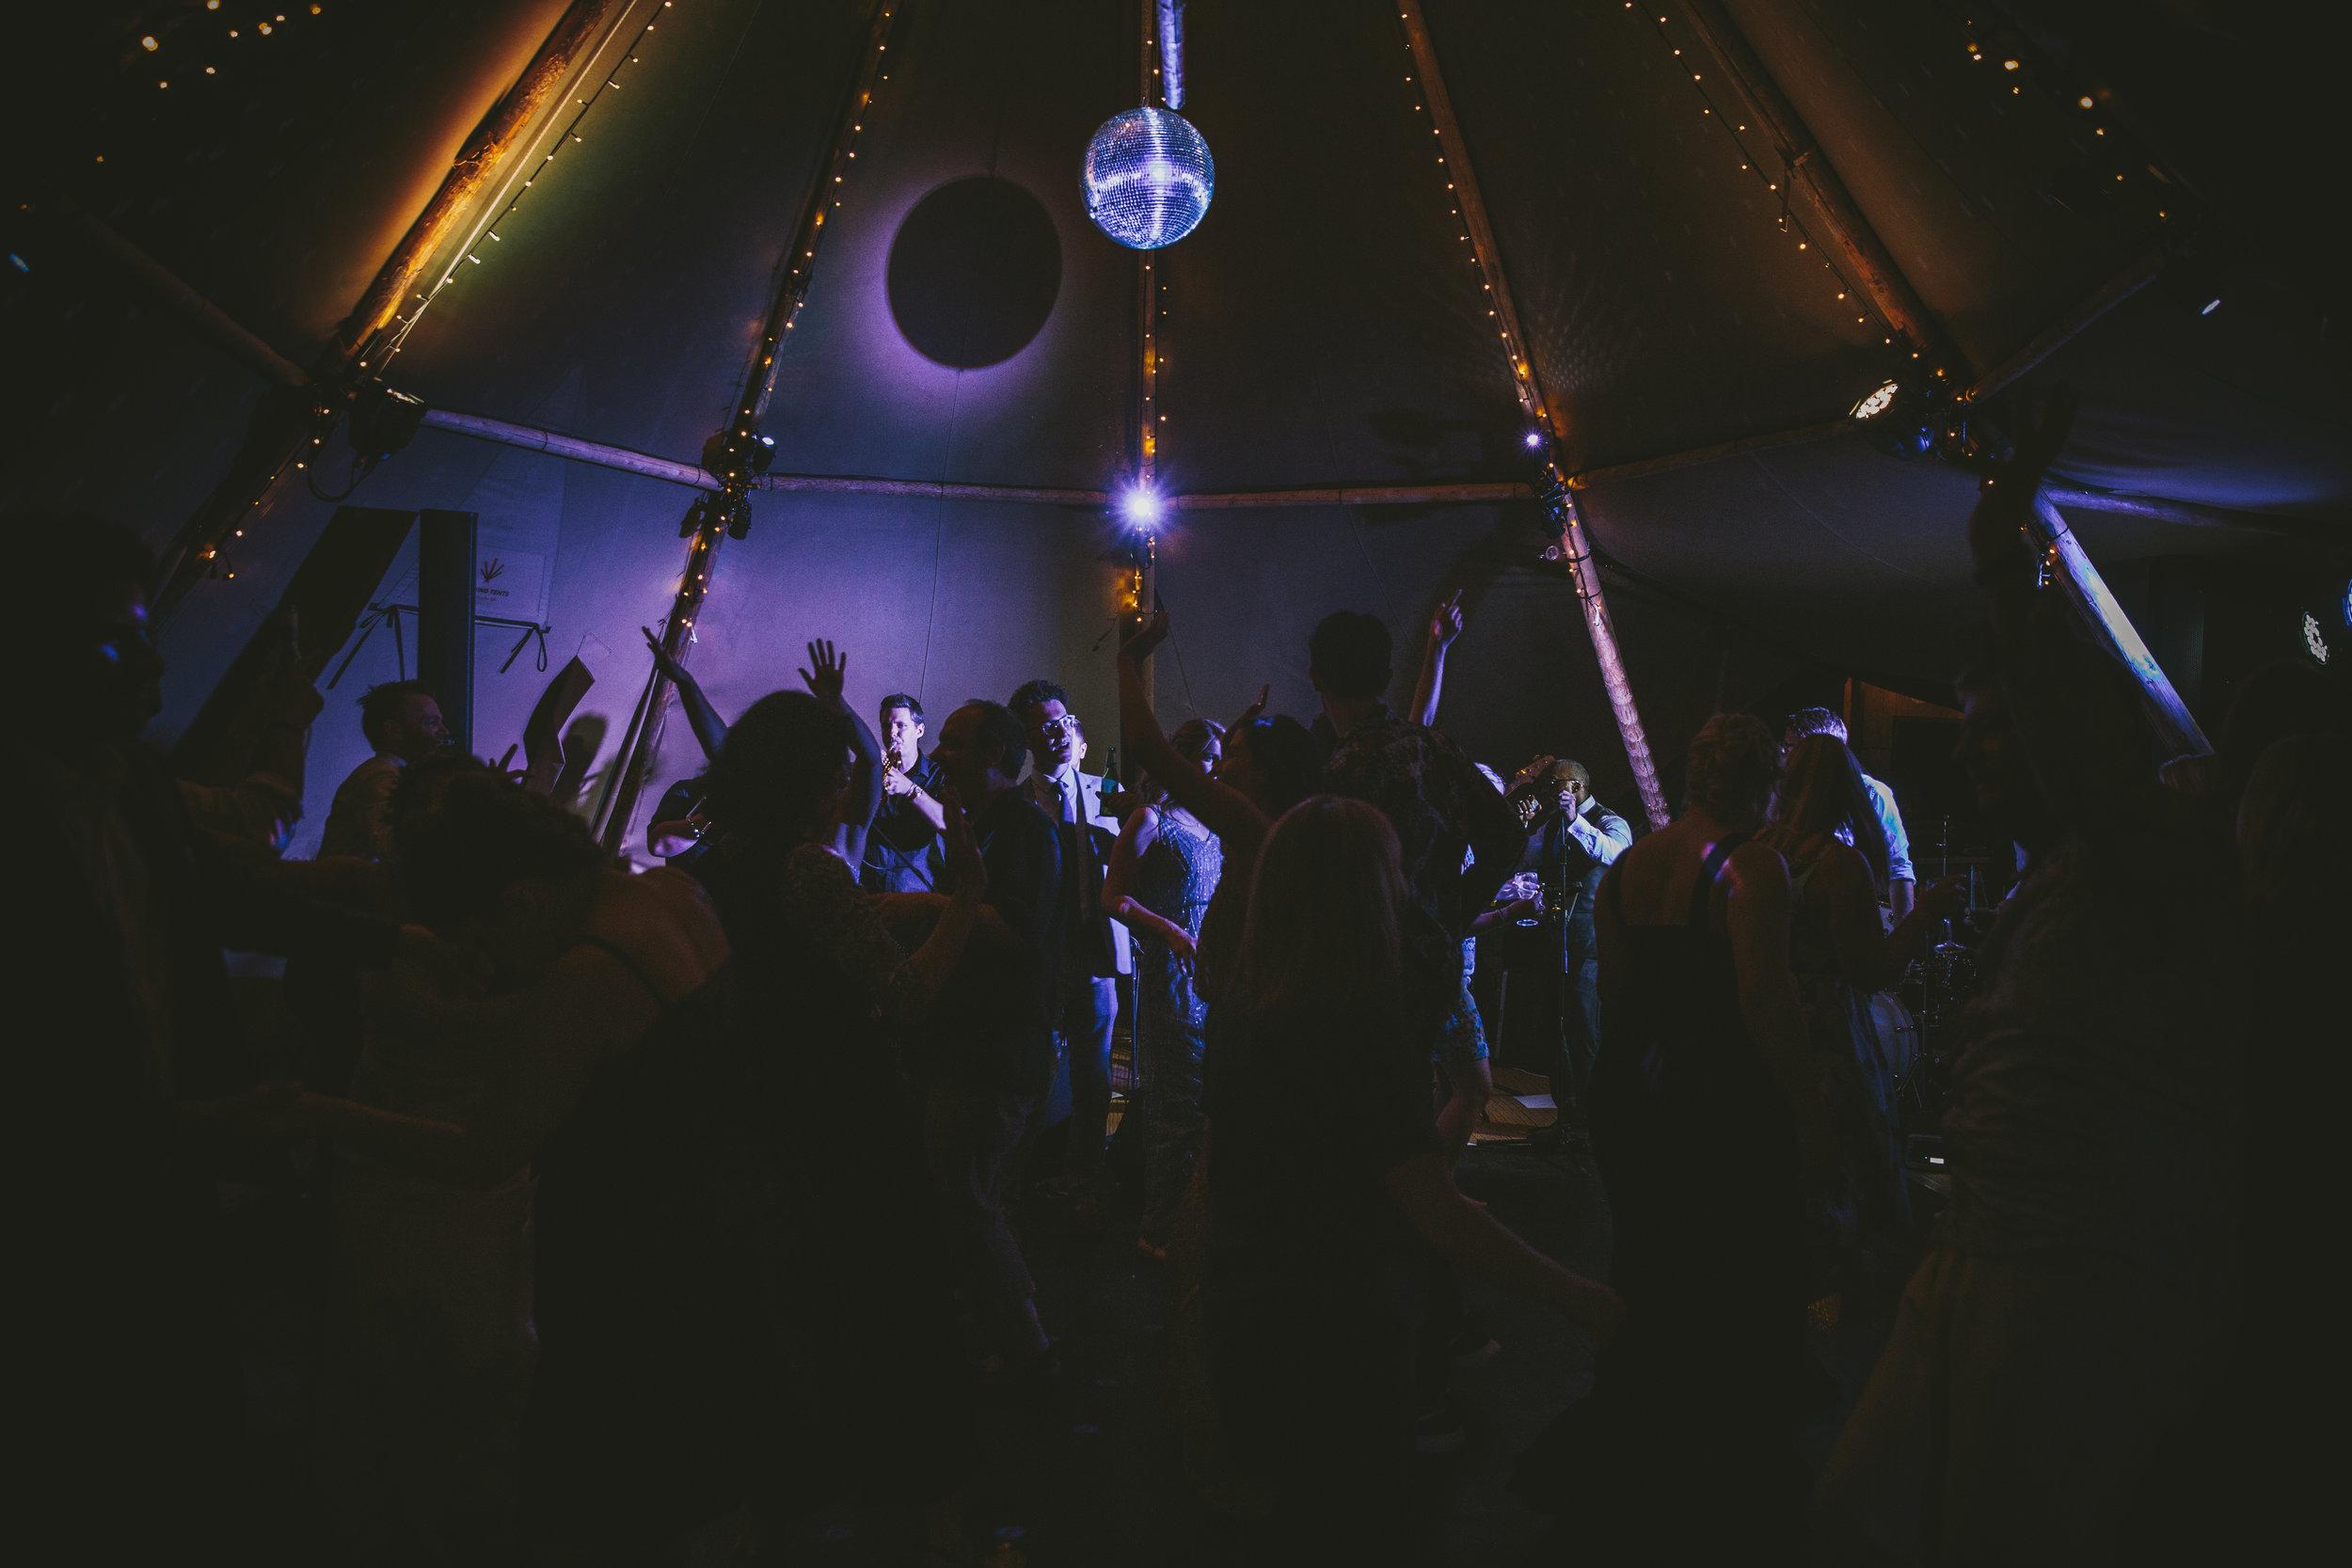 Professional dance floor lights & mirror ball